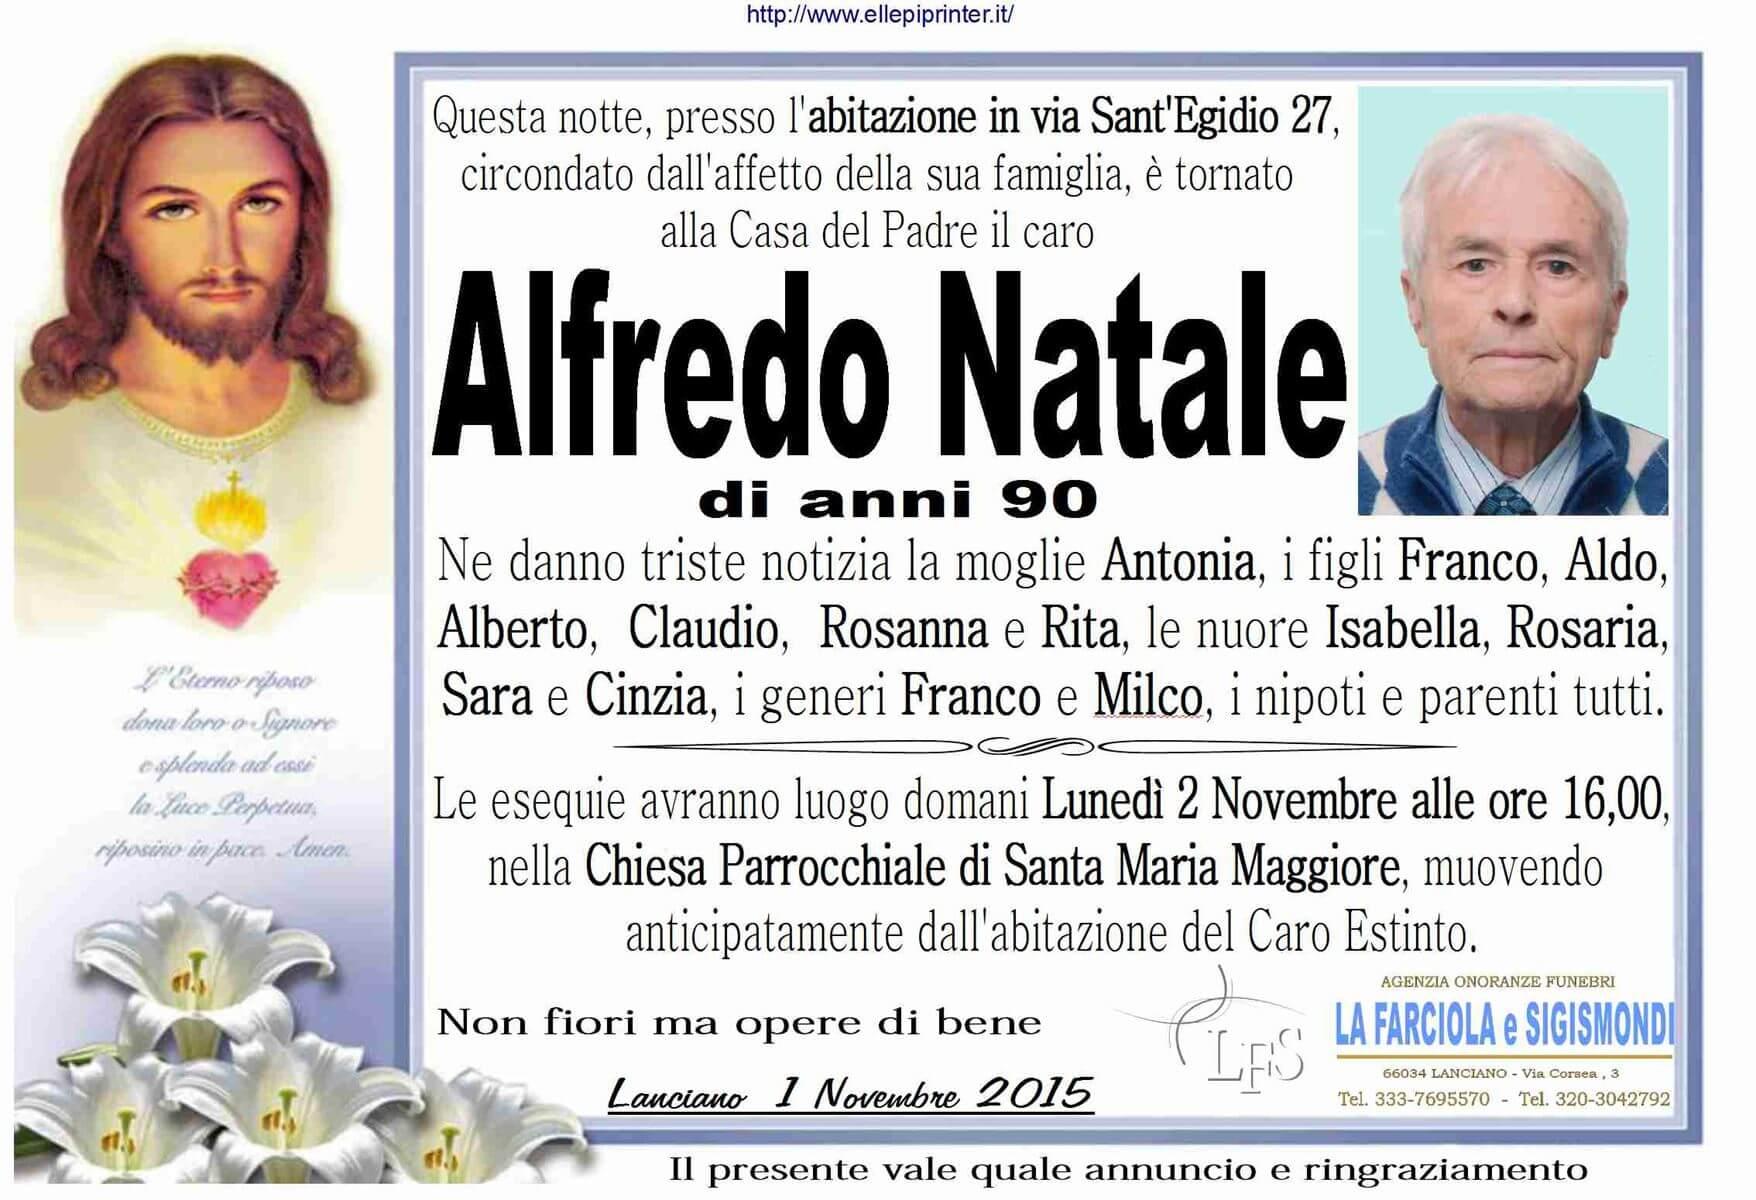 MANIFESTO NATALE ALFREDO